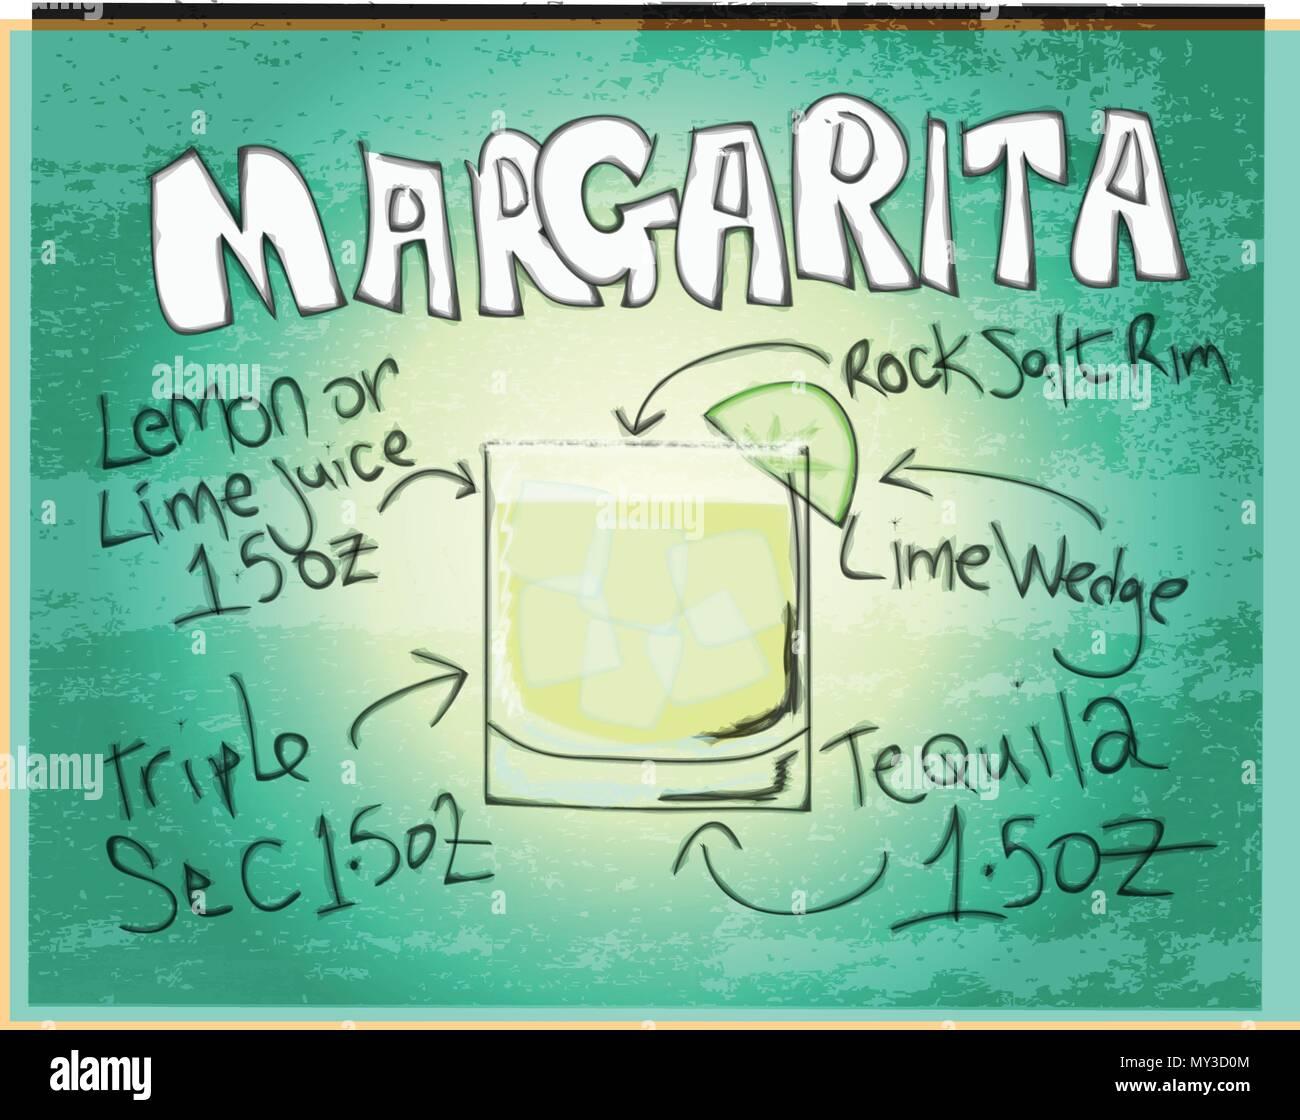 Graphic Illustration of Margarita Recipe Stock Vector